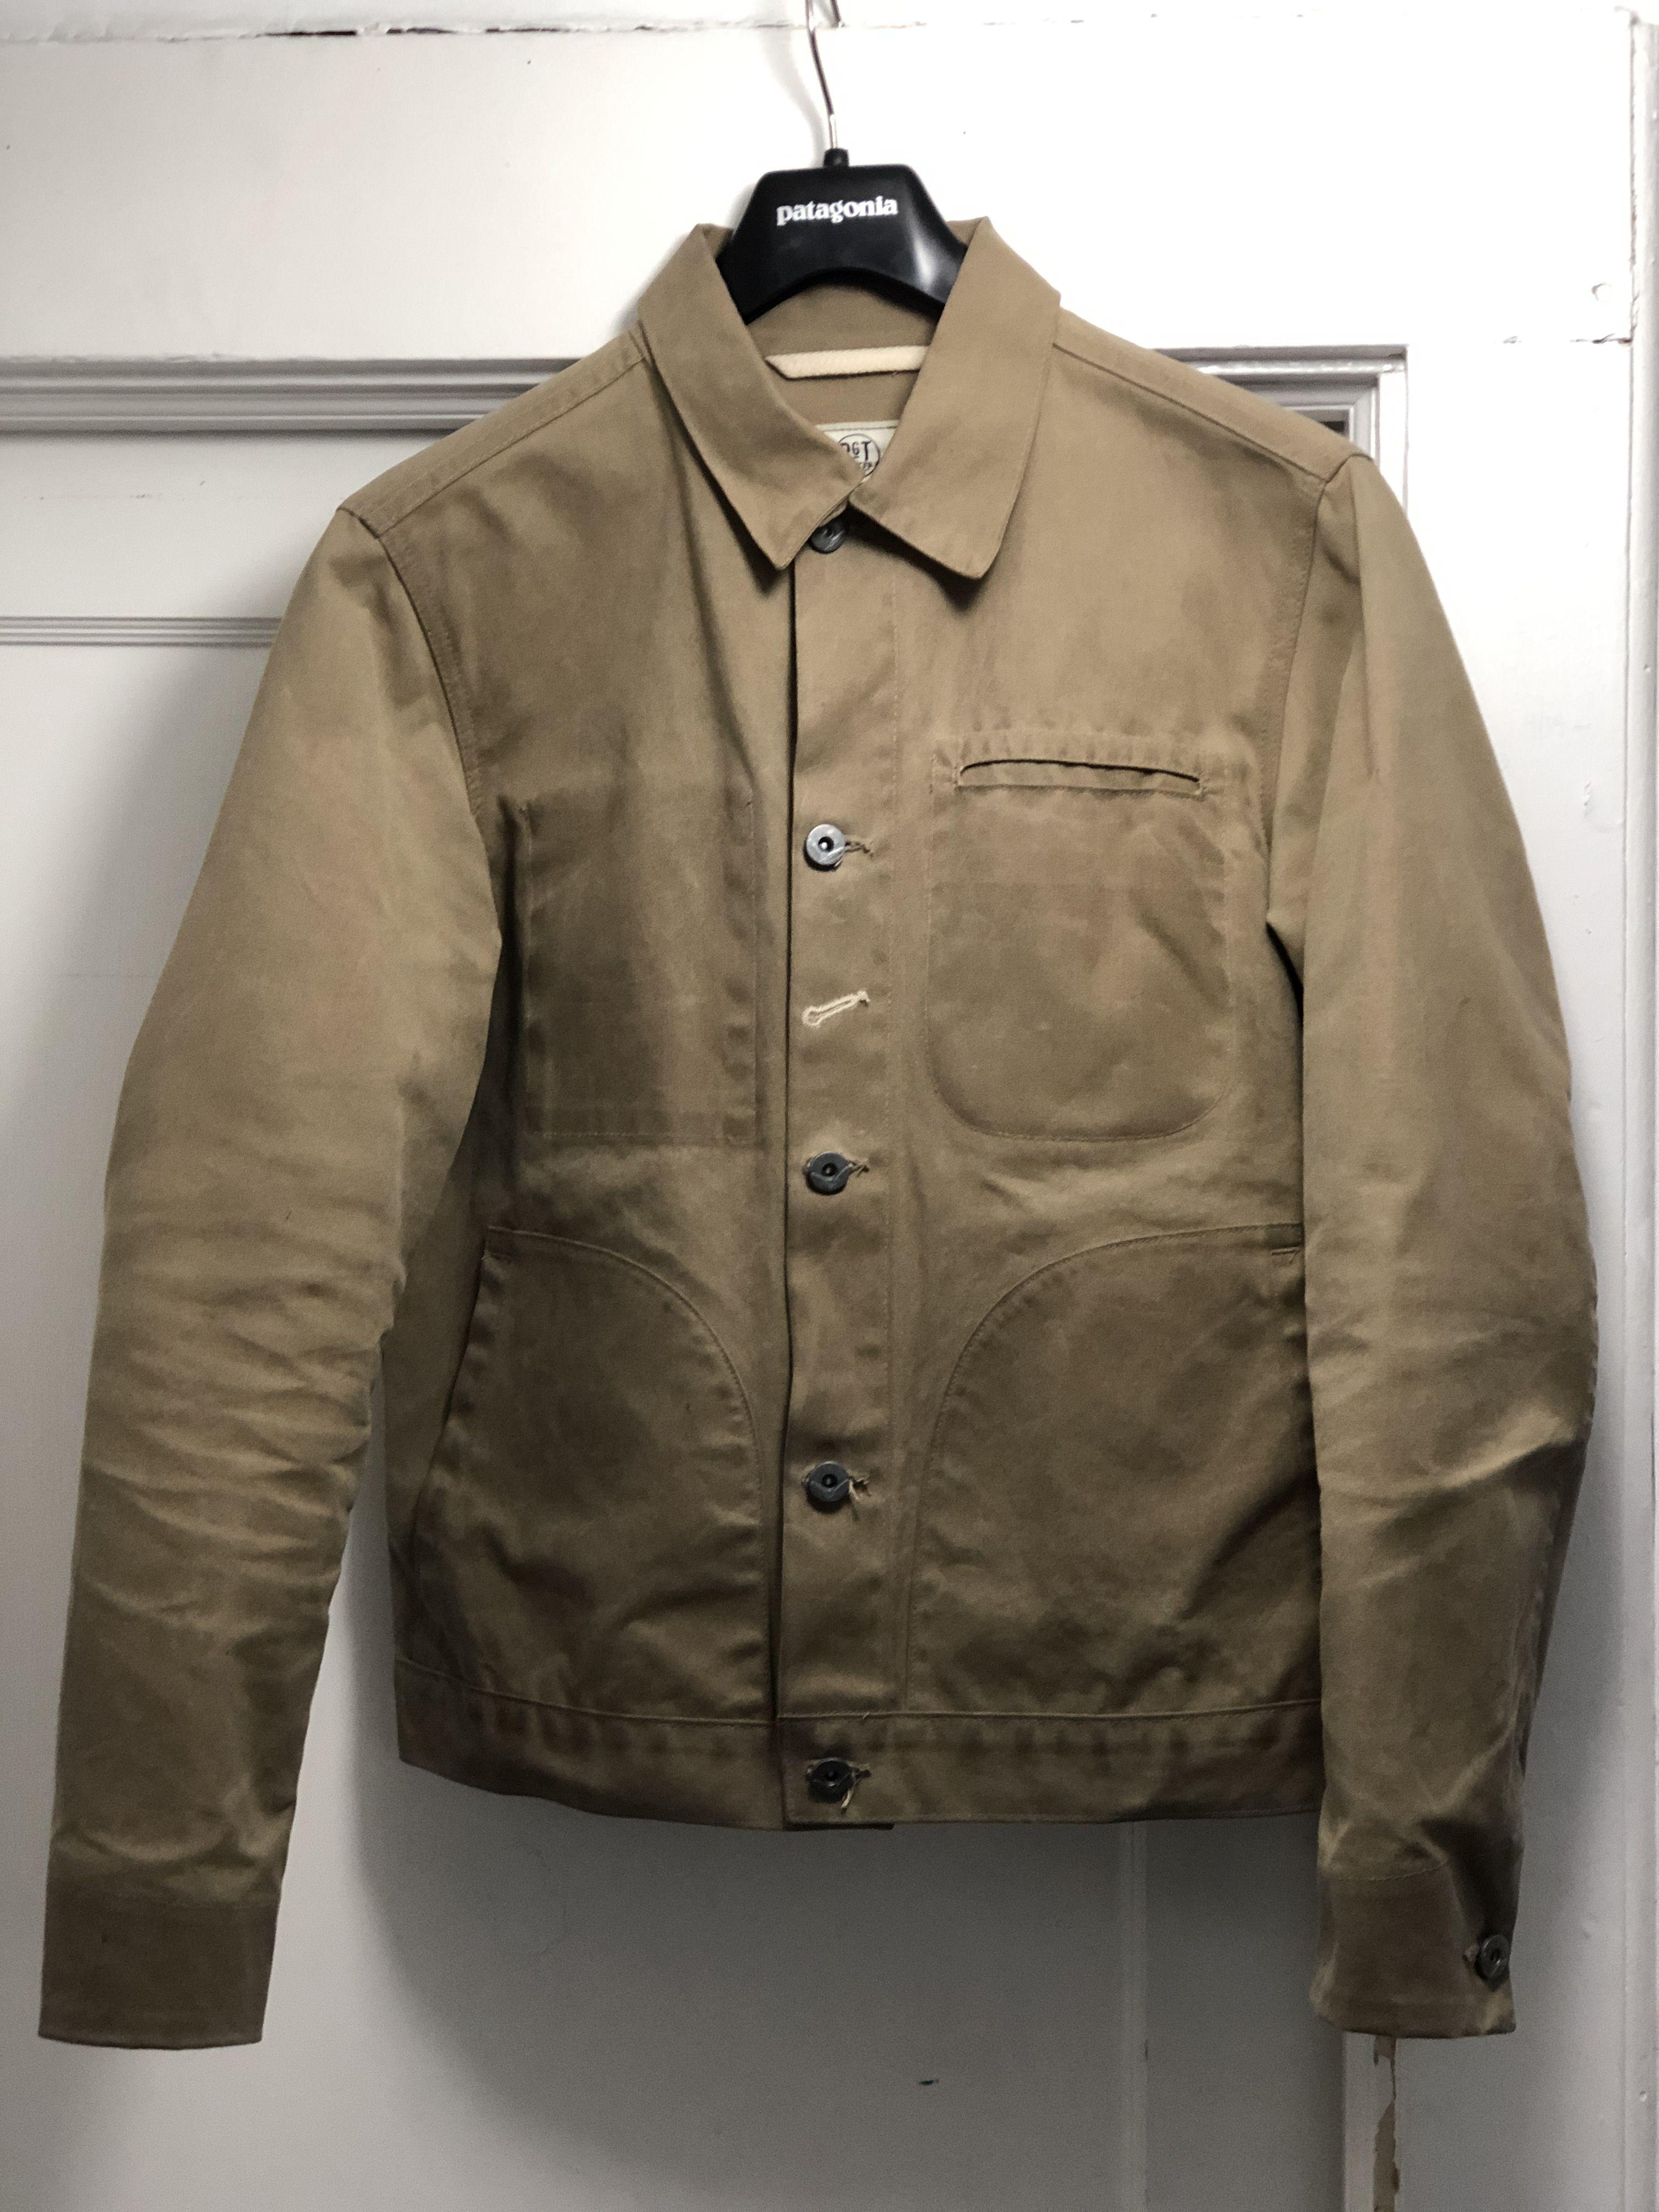 Rogue Territory Supply Jacket sz M 150$